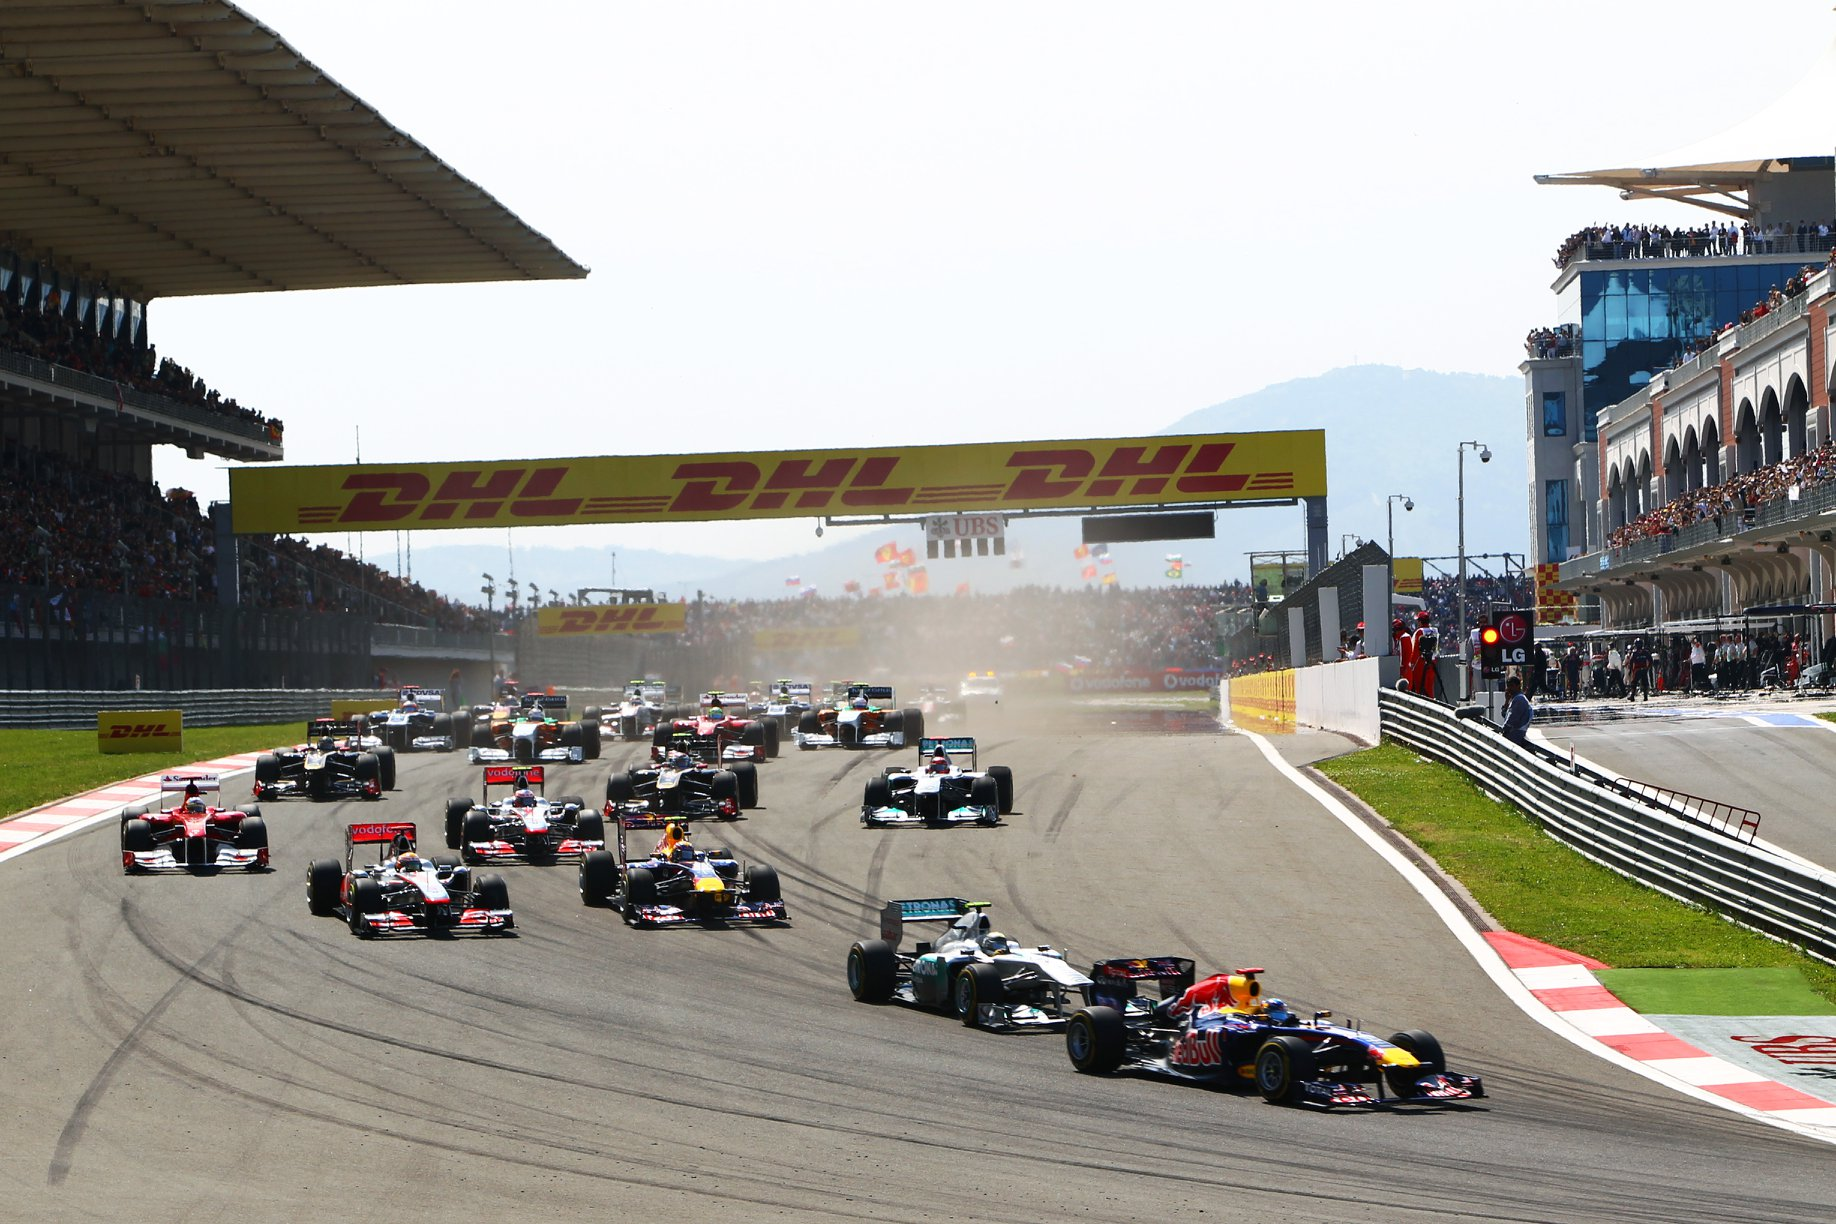 2010 Turkish Grand Prix.jpg